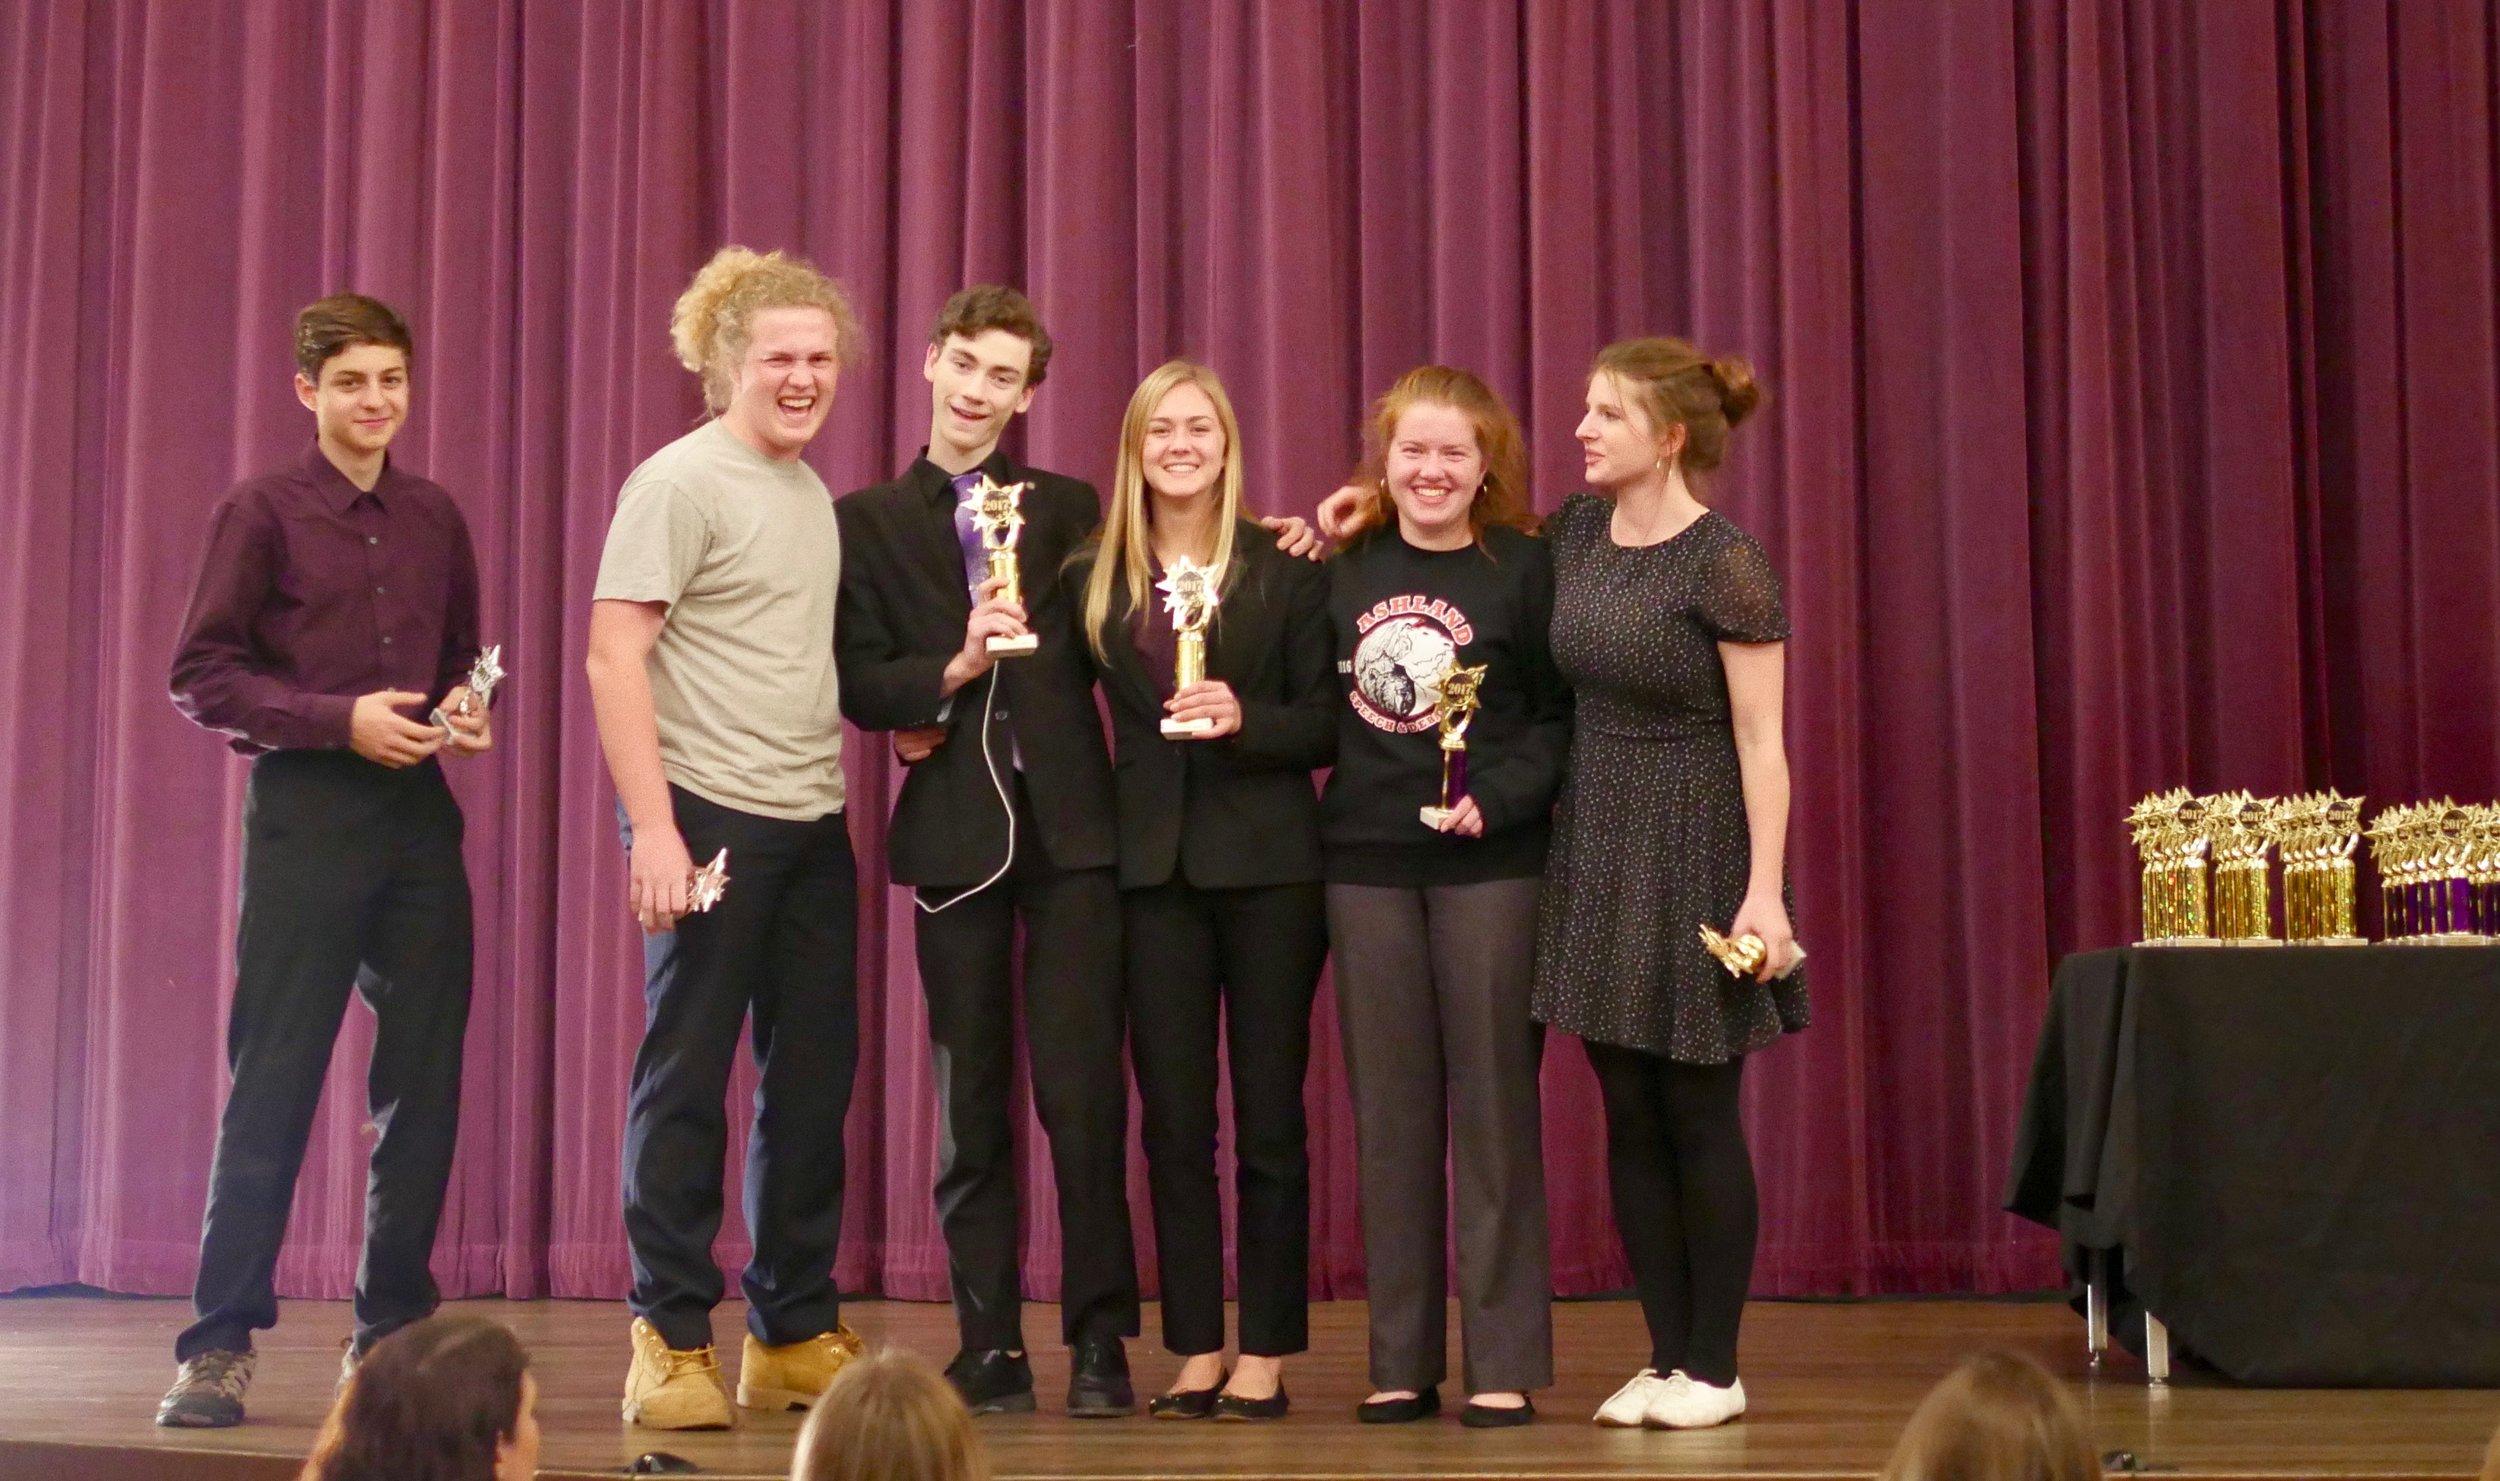 (from left) Jackson Rice, Daniel Noonan, Alex Webb, Hannah Doyle, Sarah Aaronson, and Maya Davis receive open Parli awards.